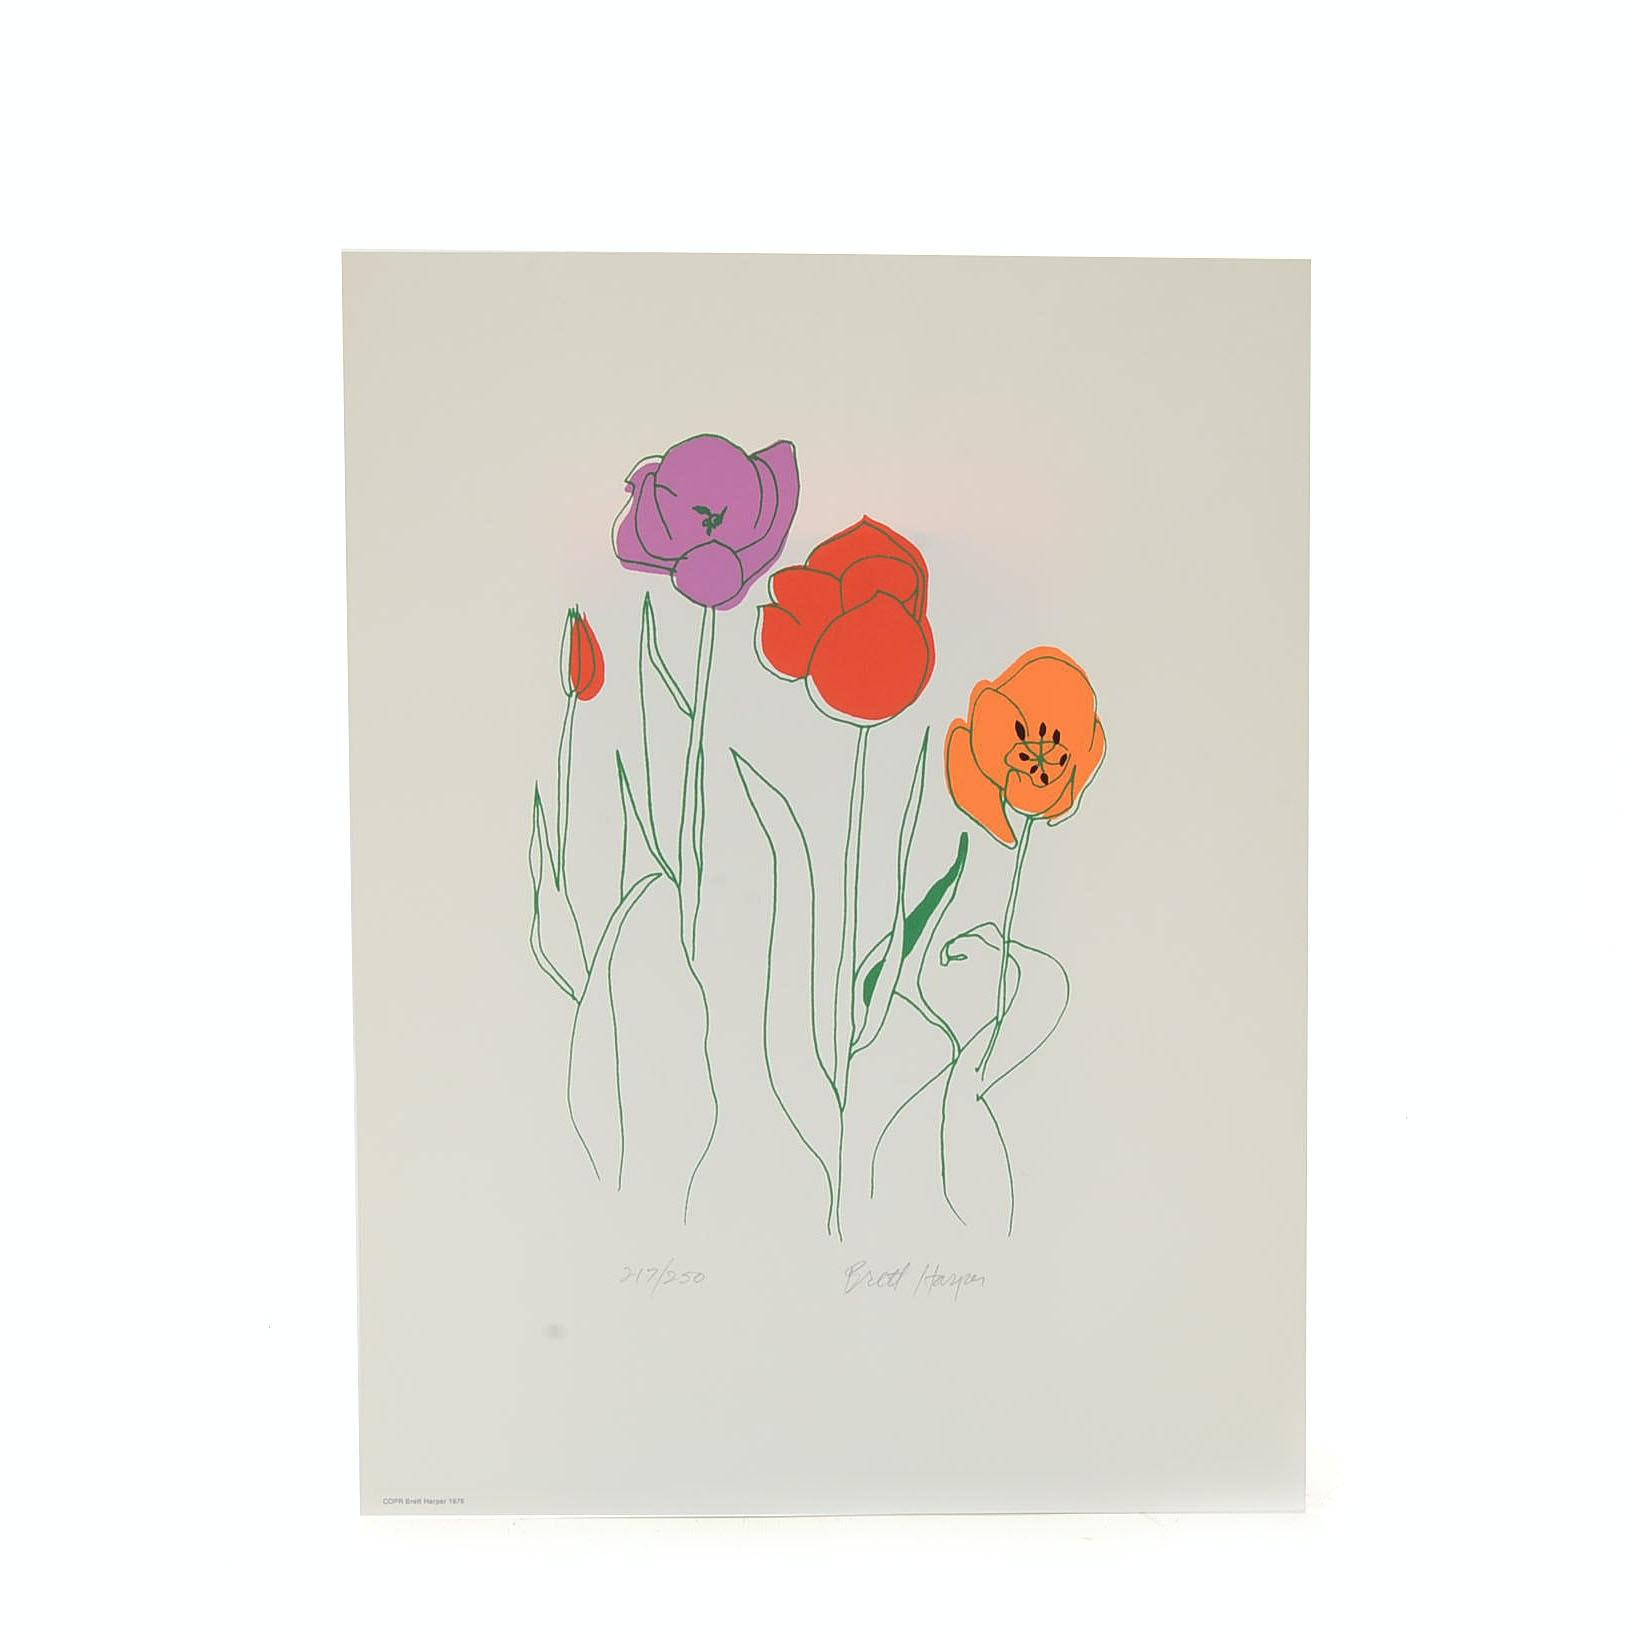 "Brett Harper Signed 1976 Limited Edition Serigraph ""Tulips"""